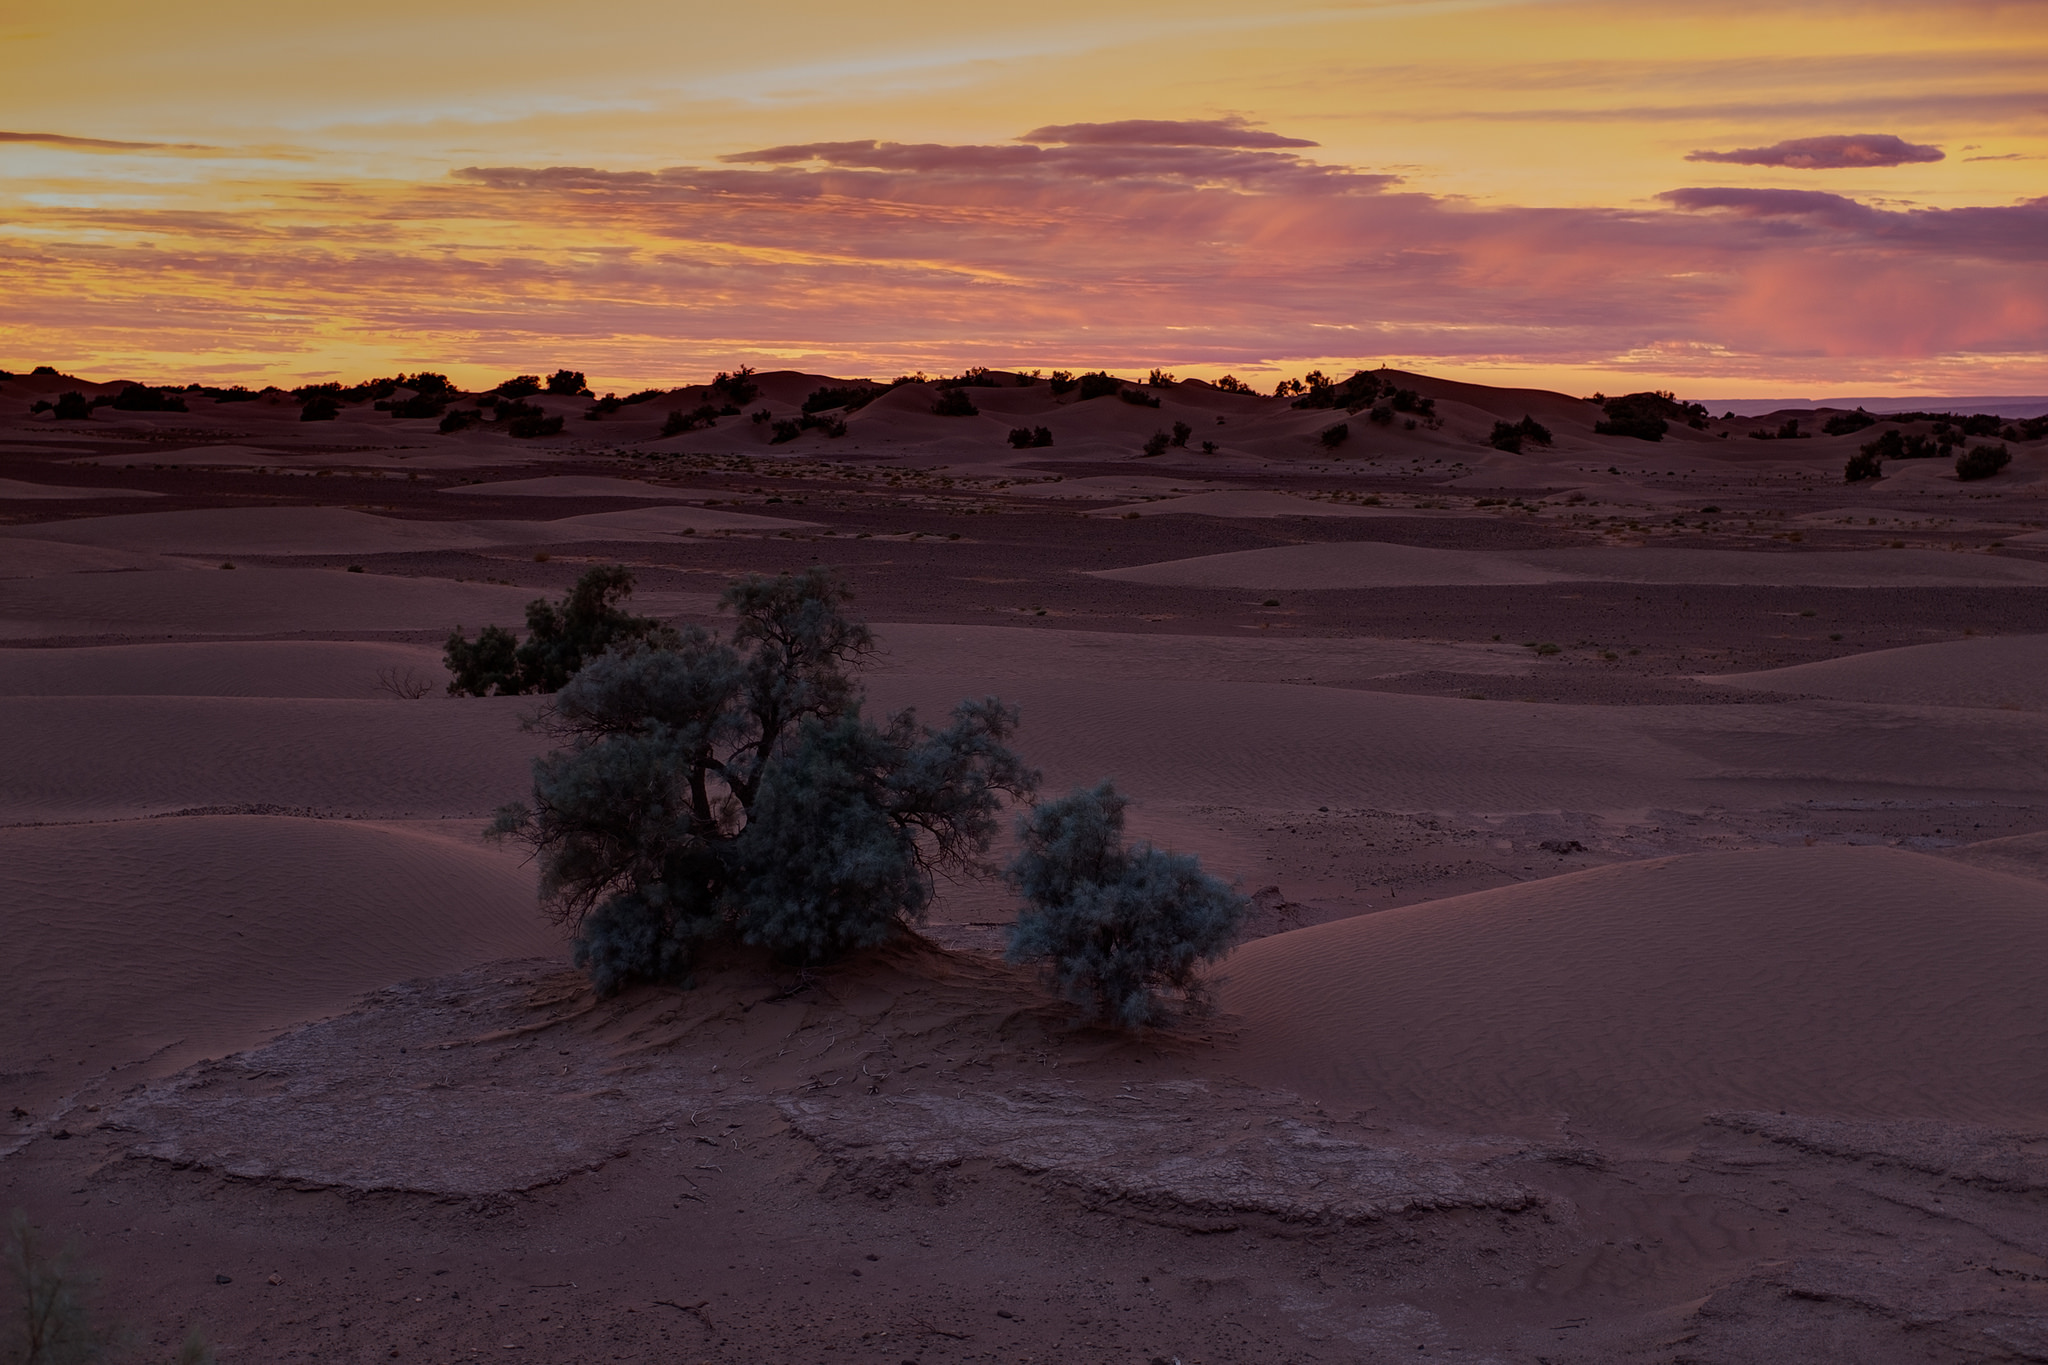 desert-au-maroc